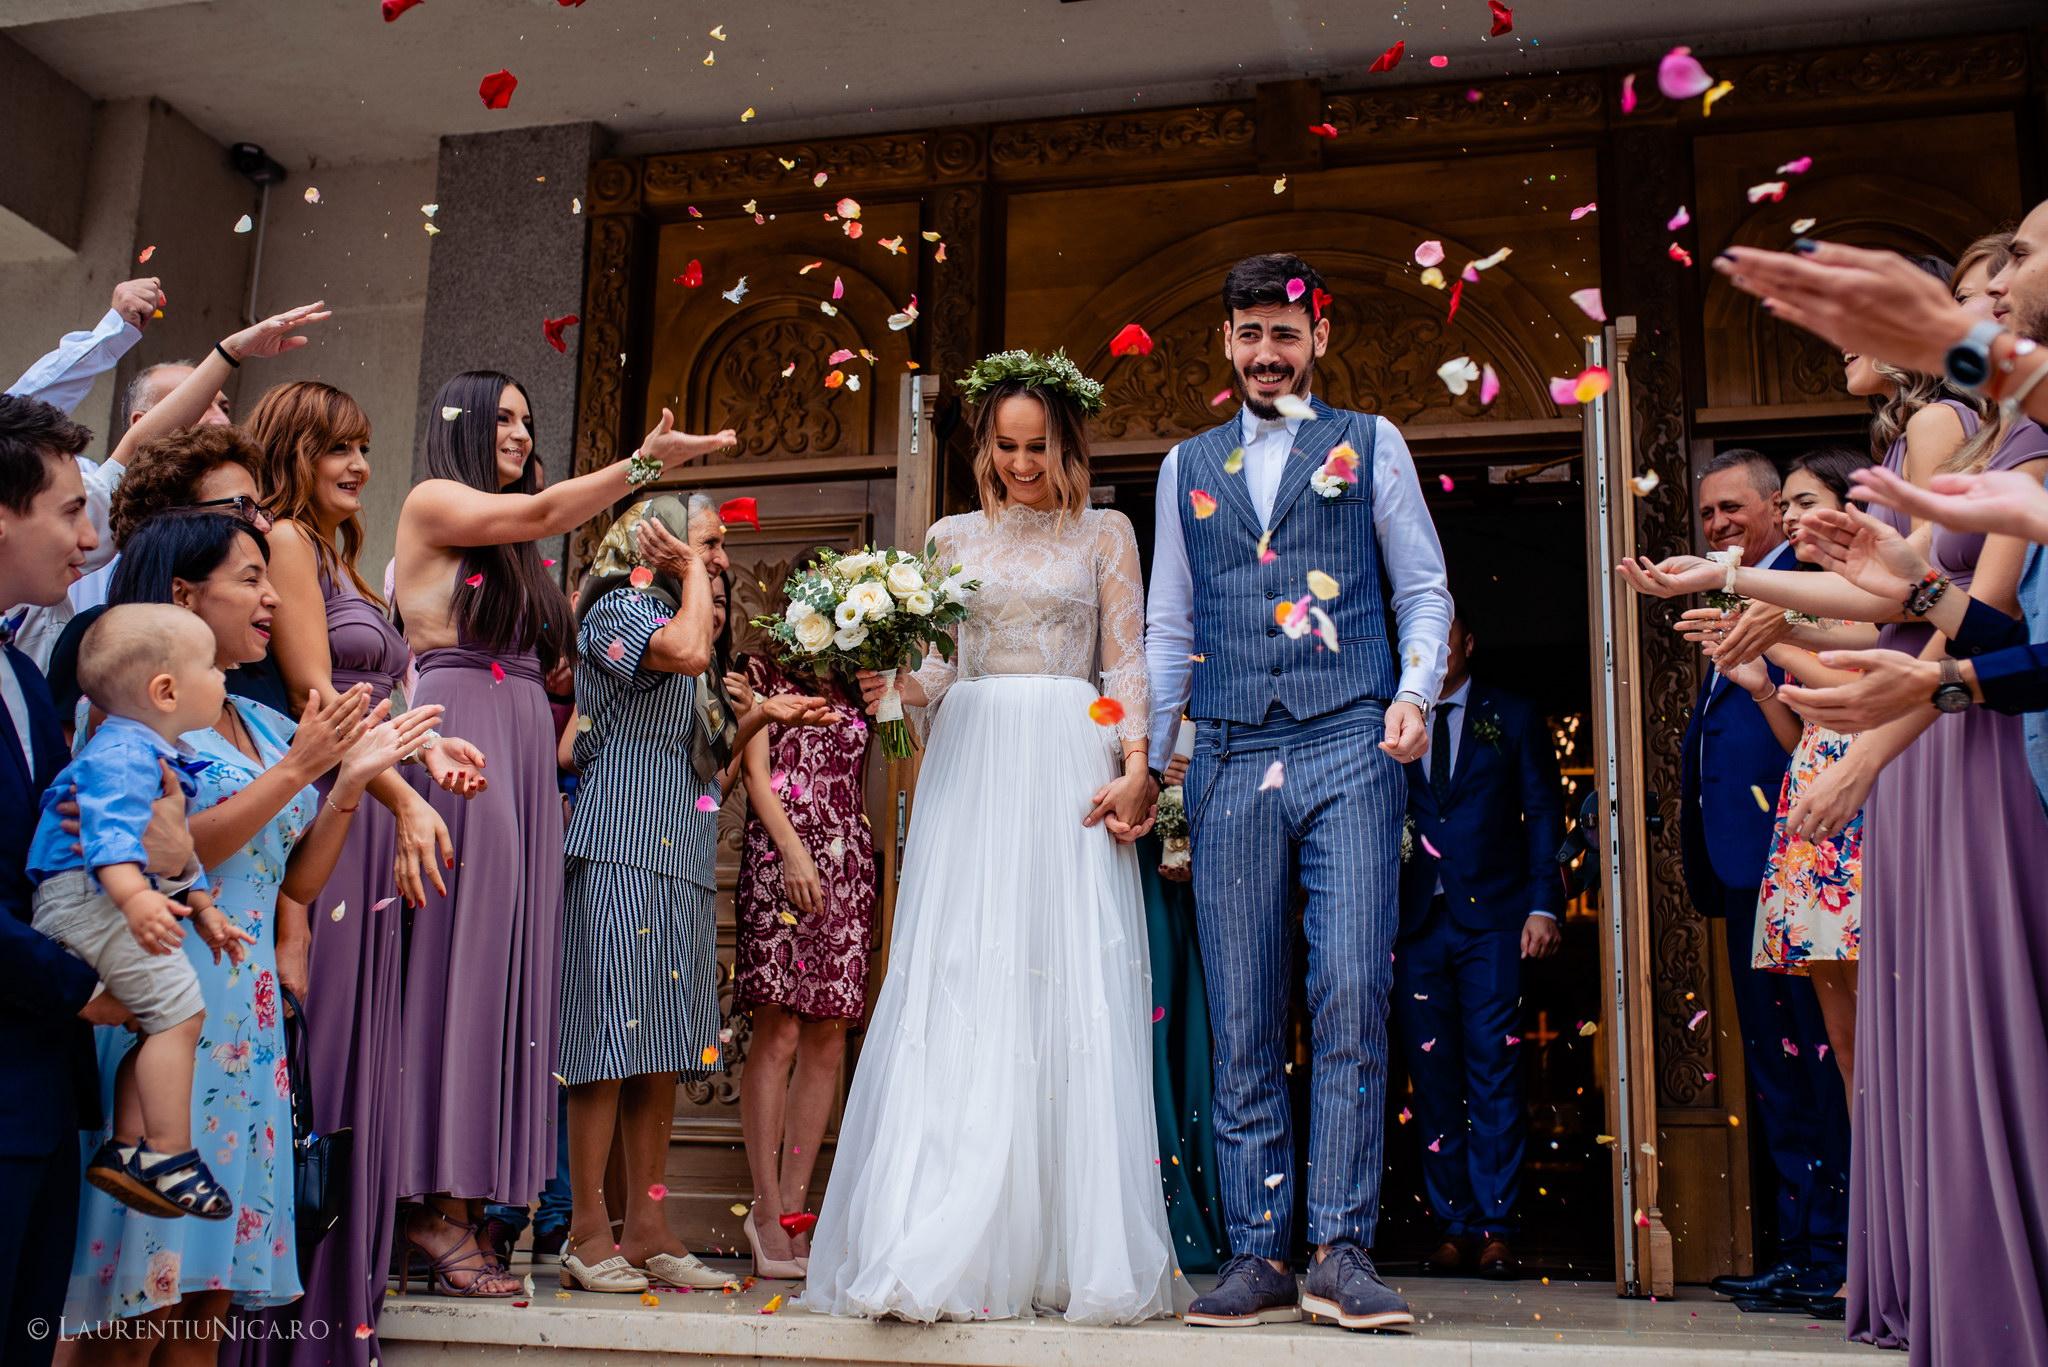 20180915 LN 0470 - Diana & Marius | Fotografii nunta | Slatina